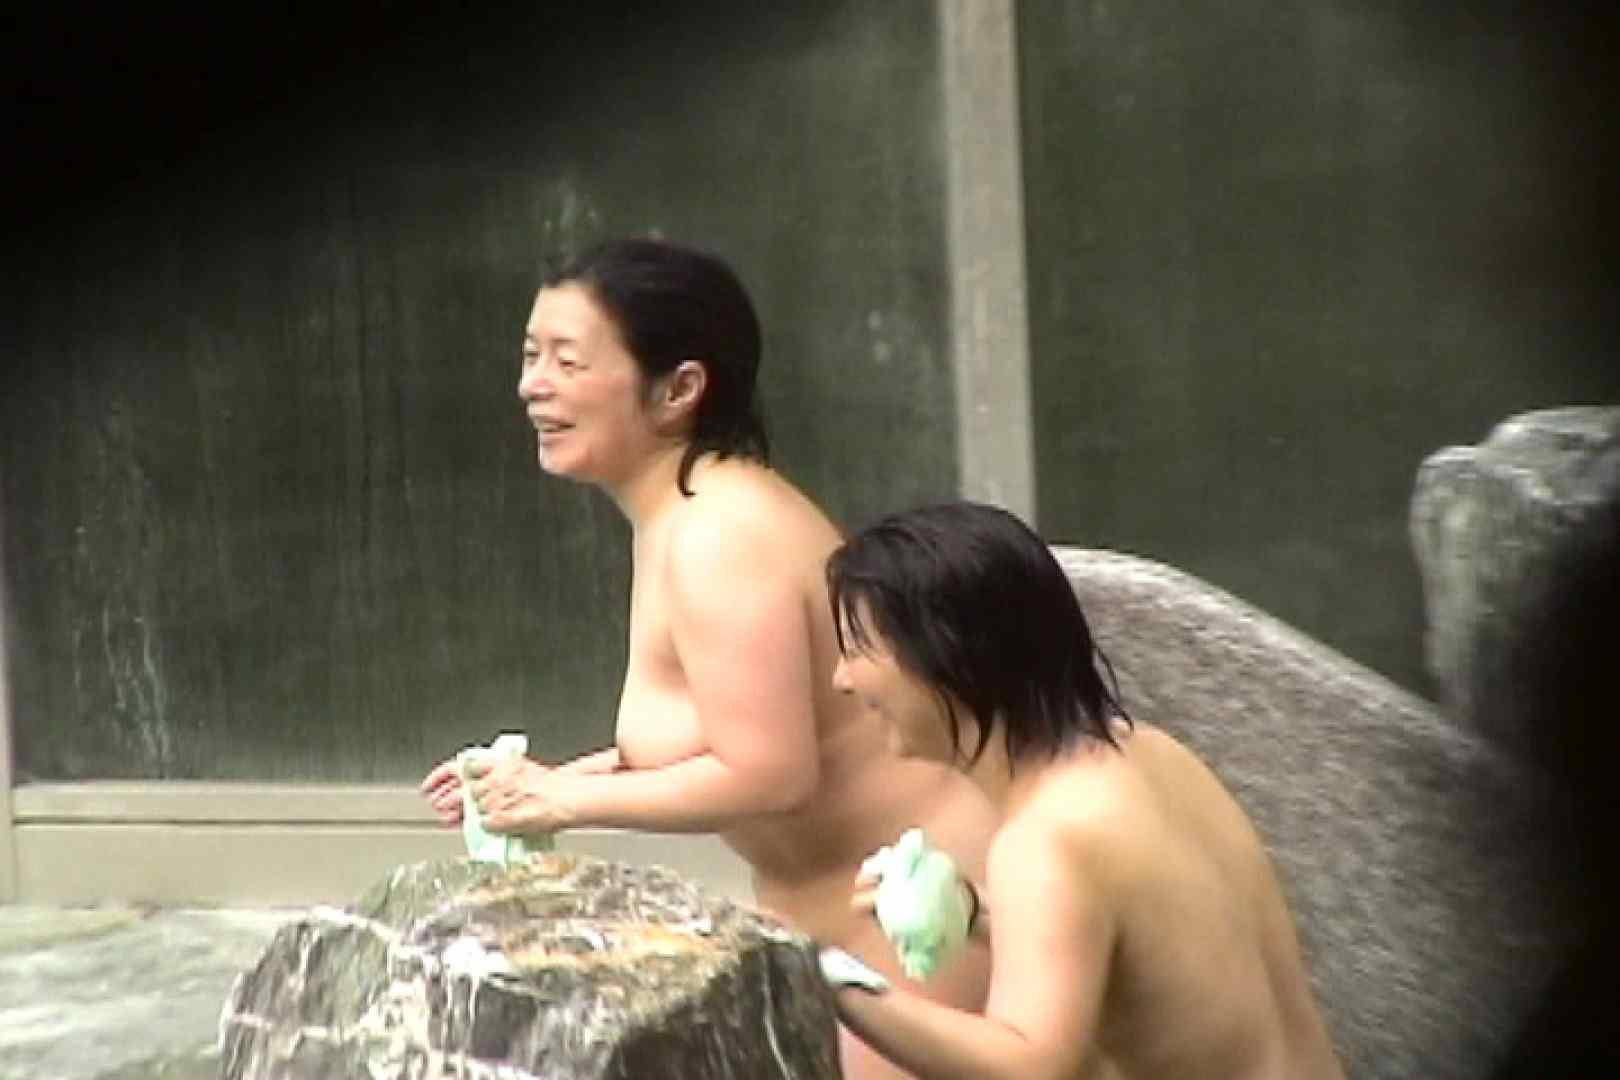 Aquaな露天風呂Vol.456 盗撮師作品  88pic 33